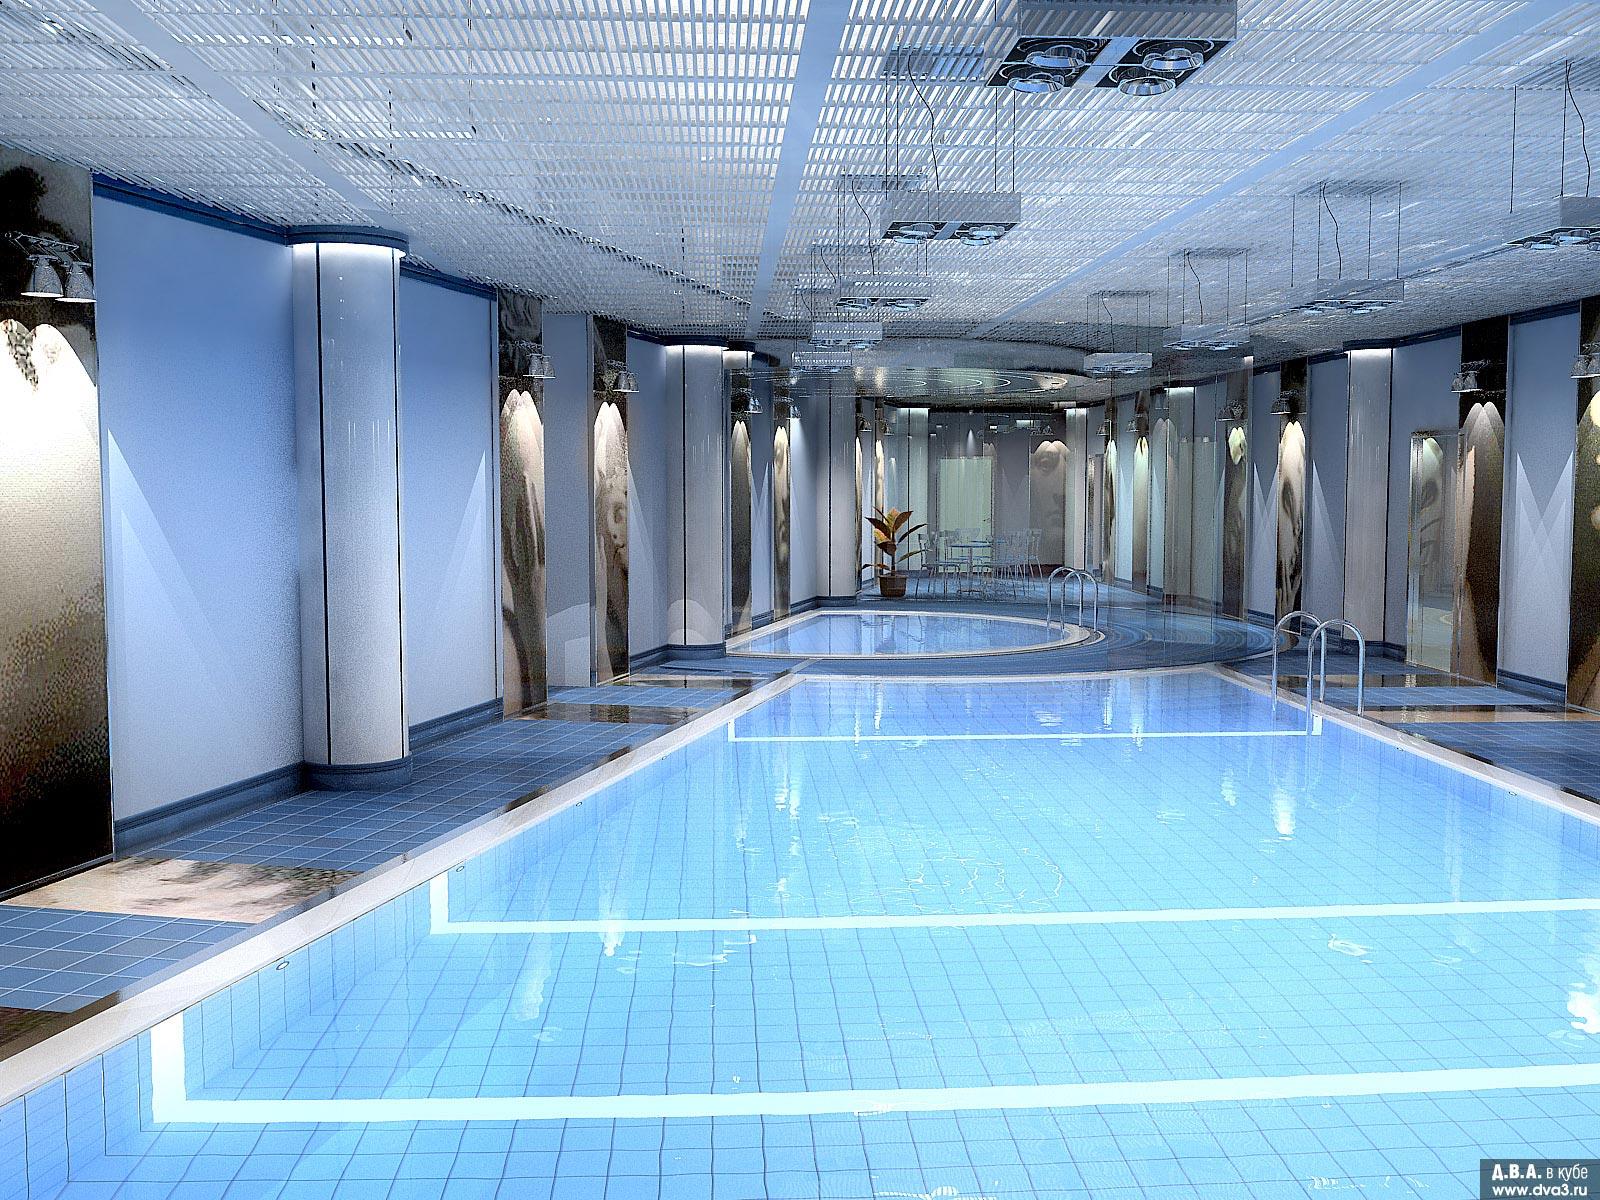 Icube architectura for Common pool design xword